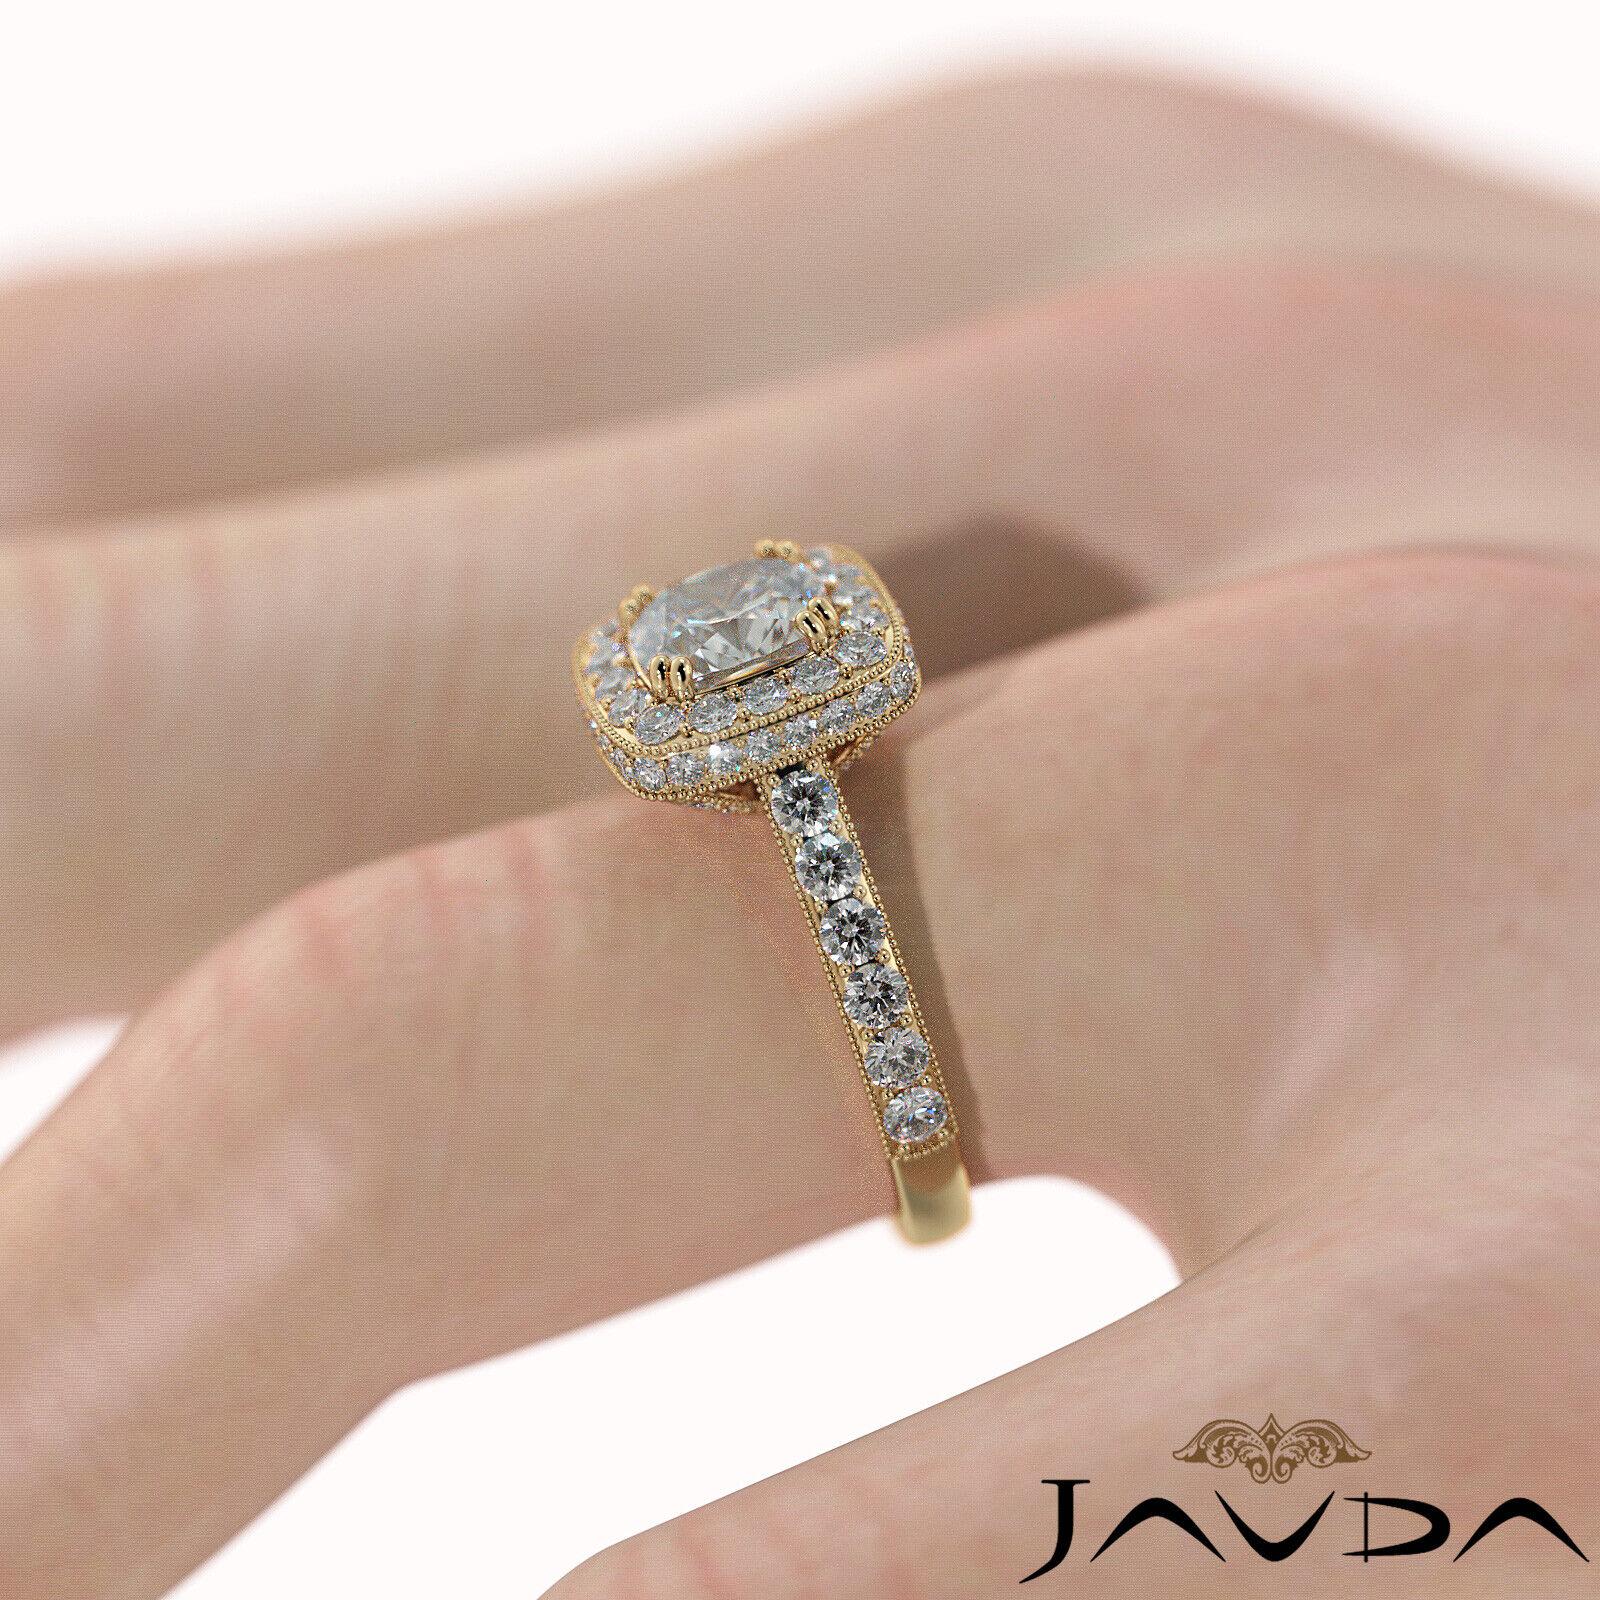 1.94ctw Milgrain Floral Basket Cushion Diamond Engagement Ring GIA E-VVS1 W Gold 11